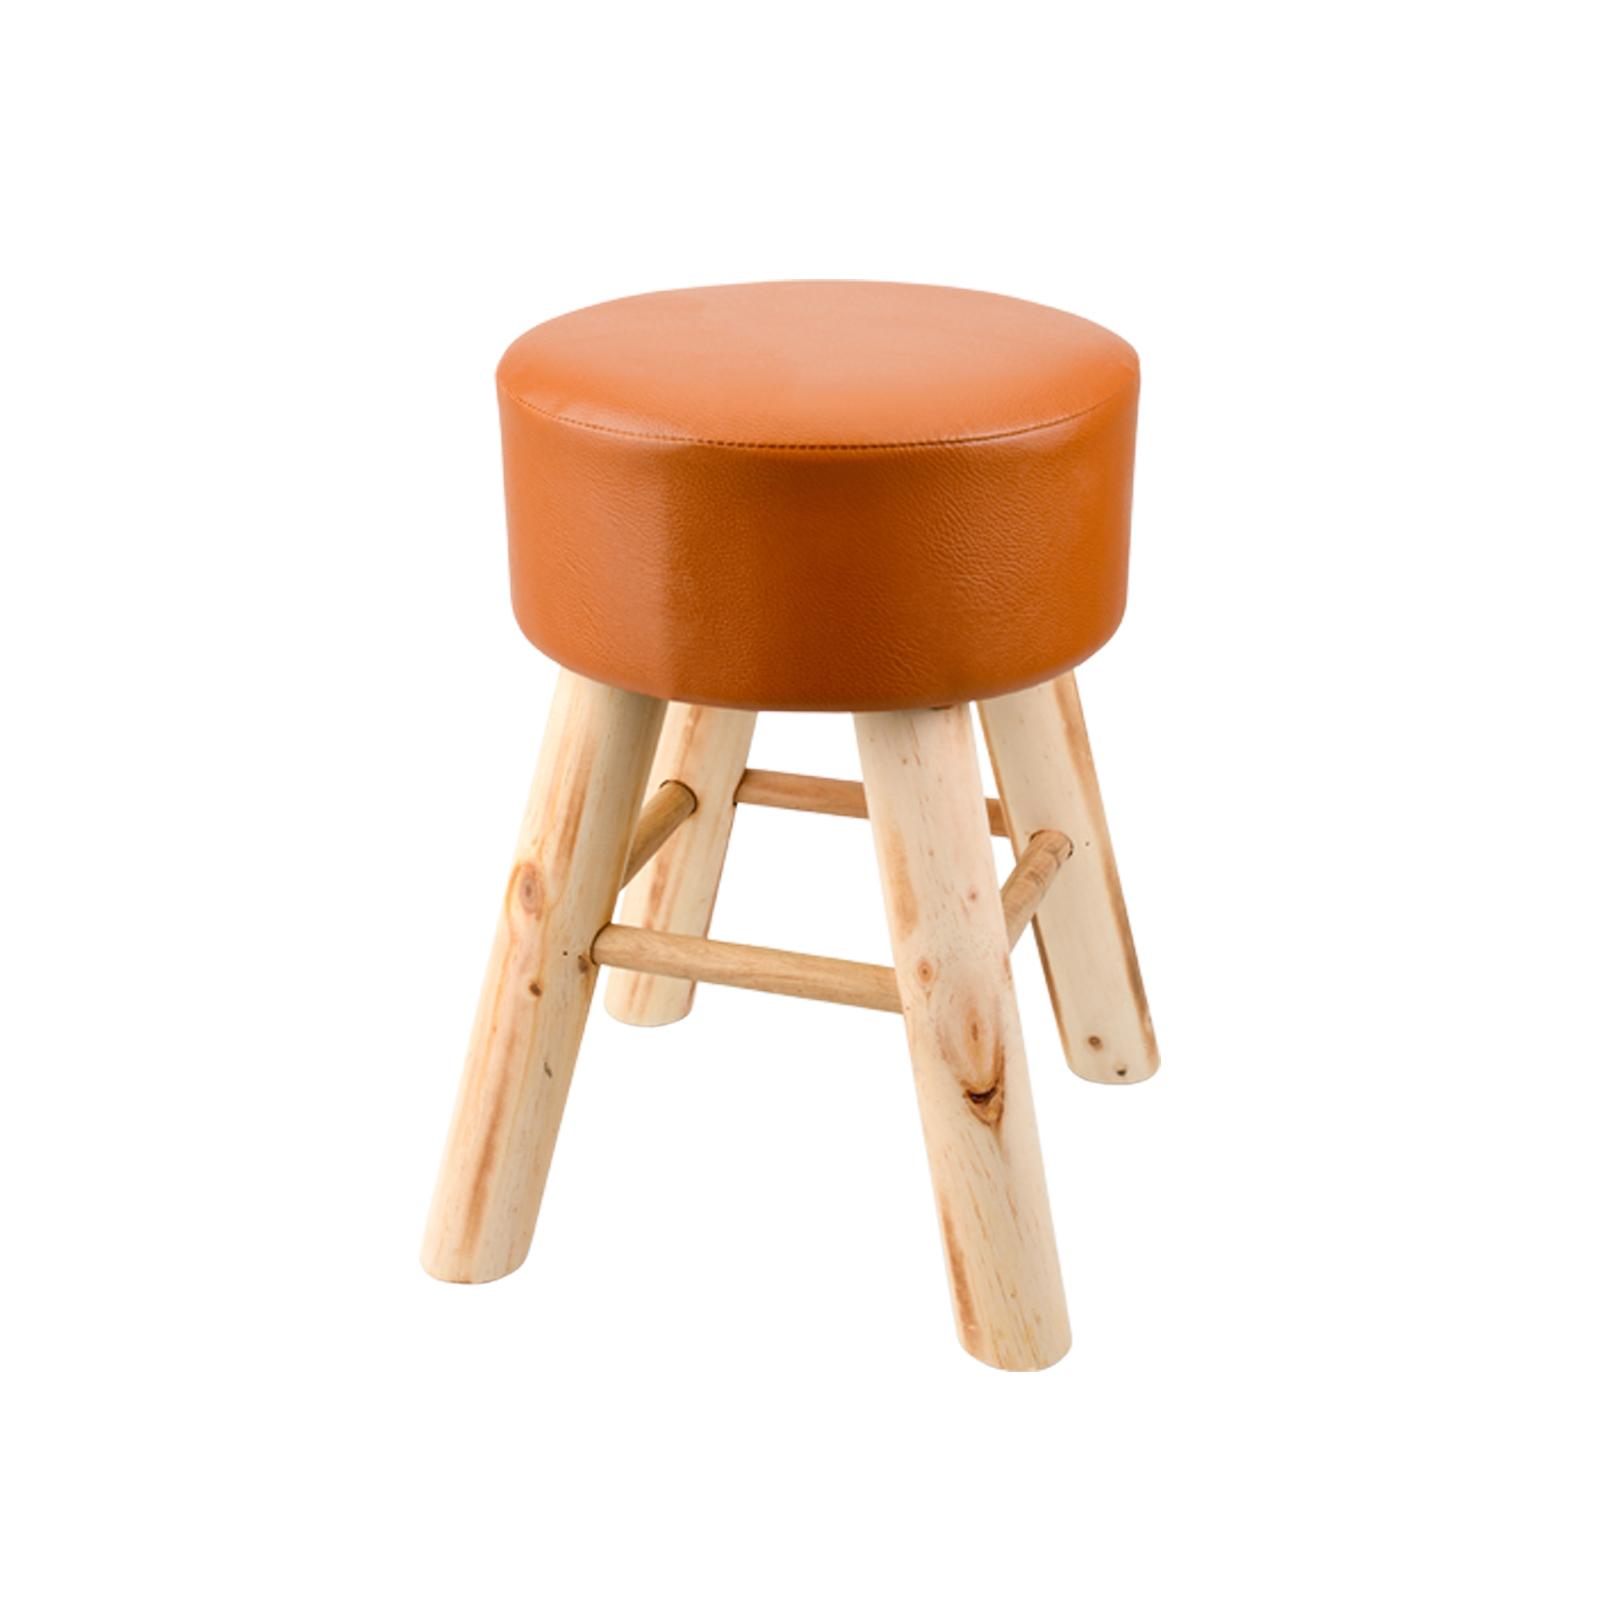 2 farben lederhocker kunstleder sitzhocker polsterhocker. Black Bedroom Furniture Sets. Home Design Ideas